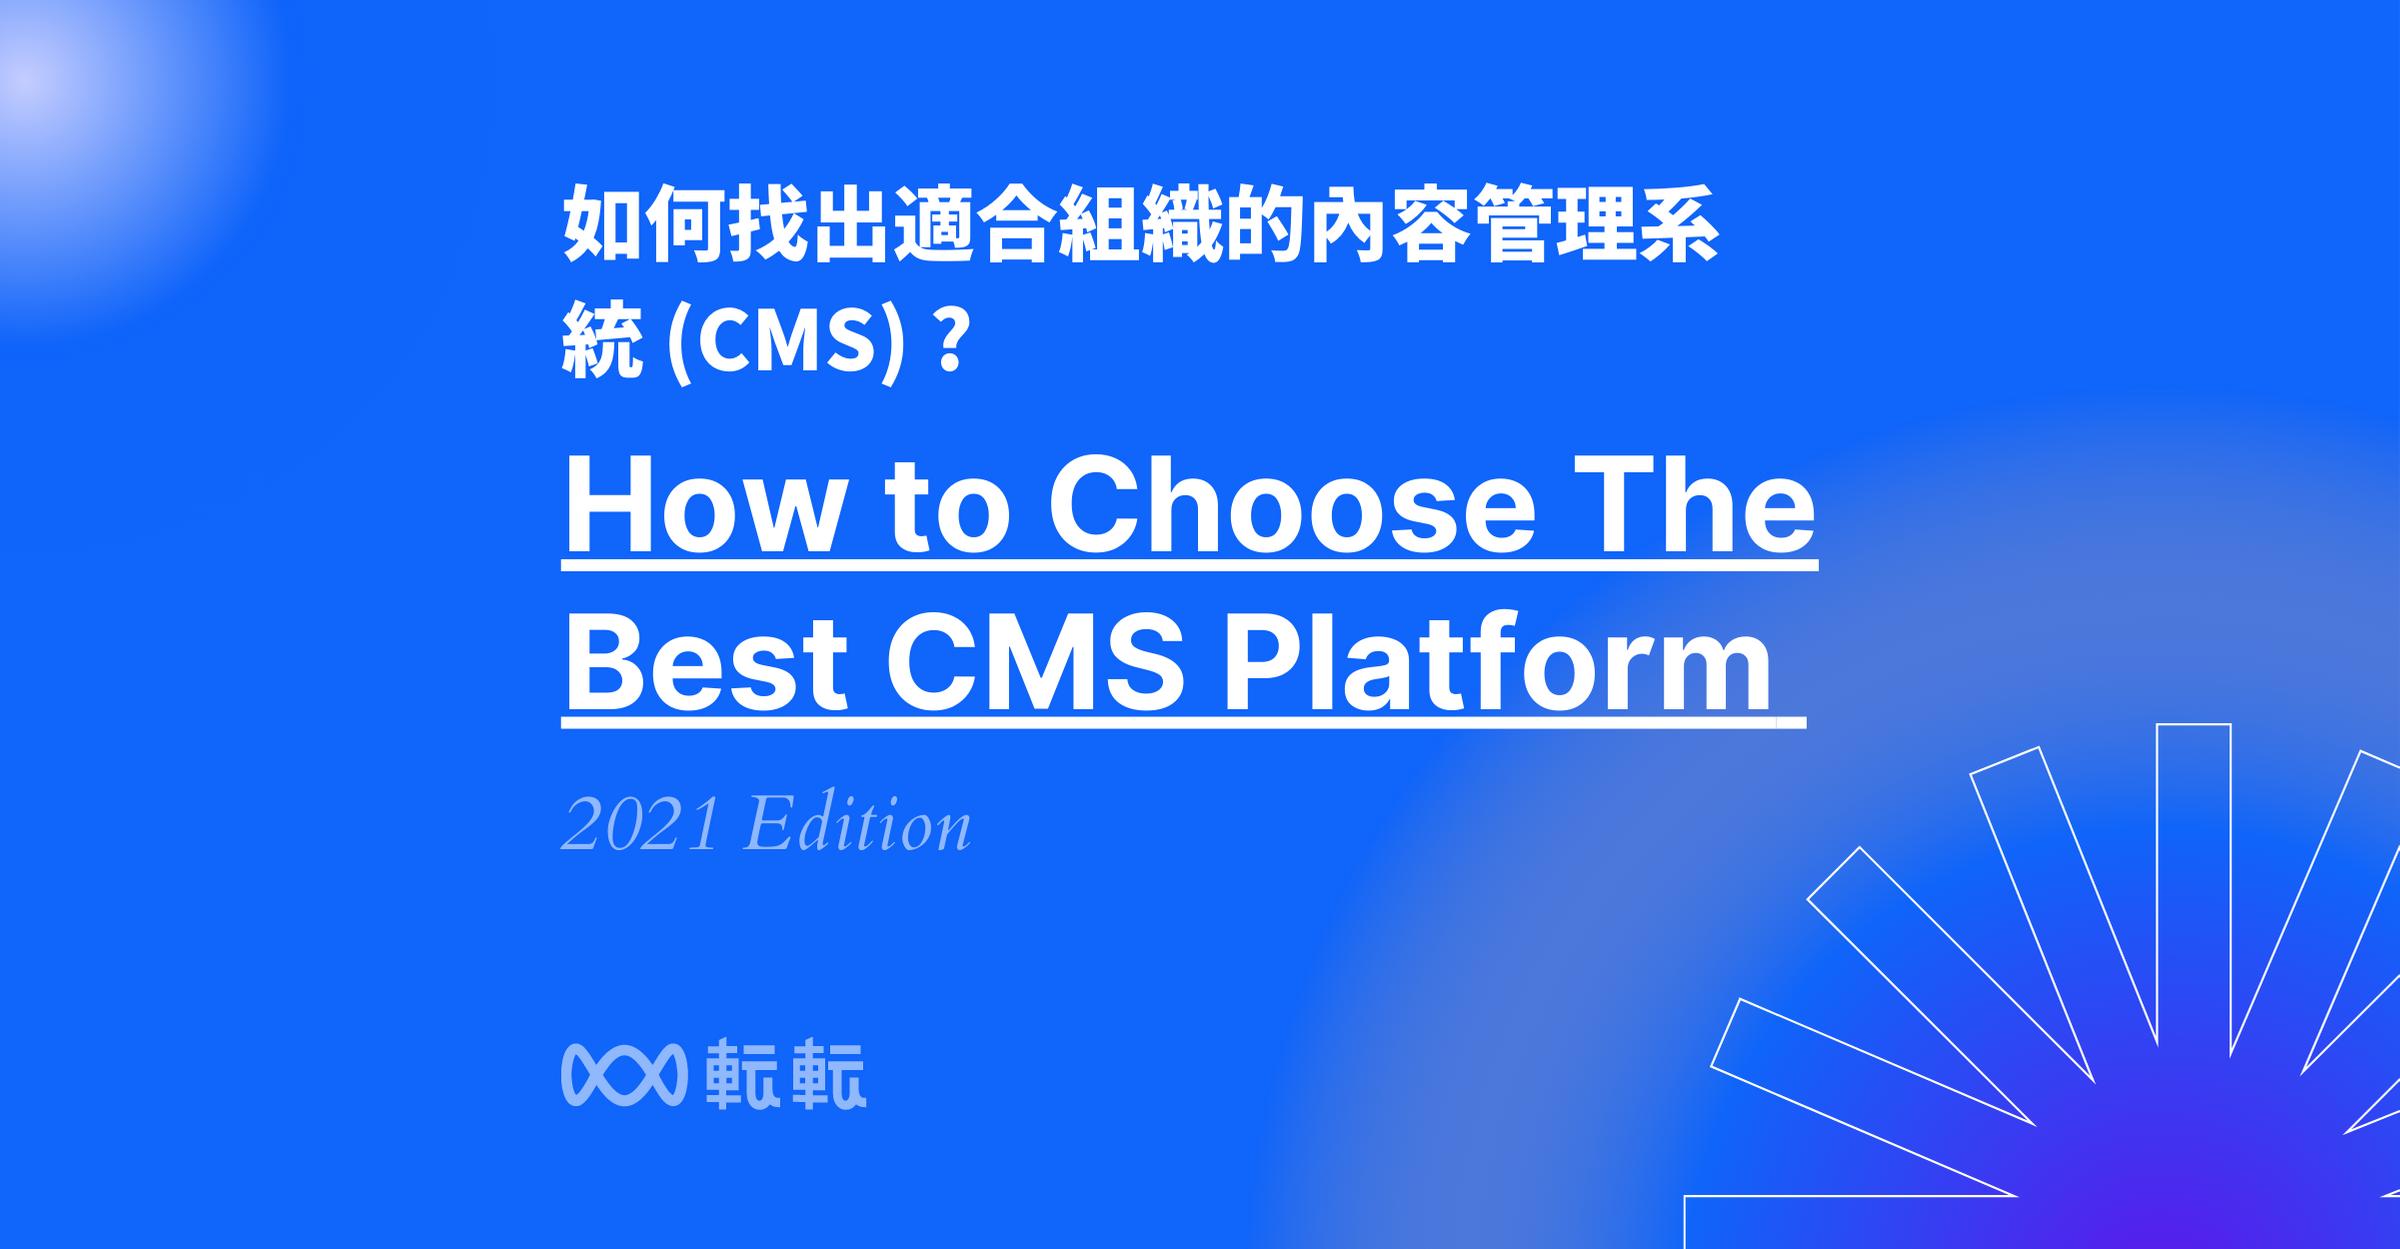 How to Choose The Best CMS Platform, 如何找出適合組織的內容管理系統